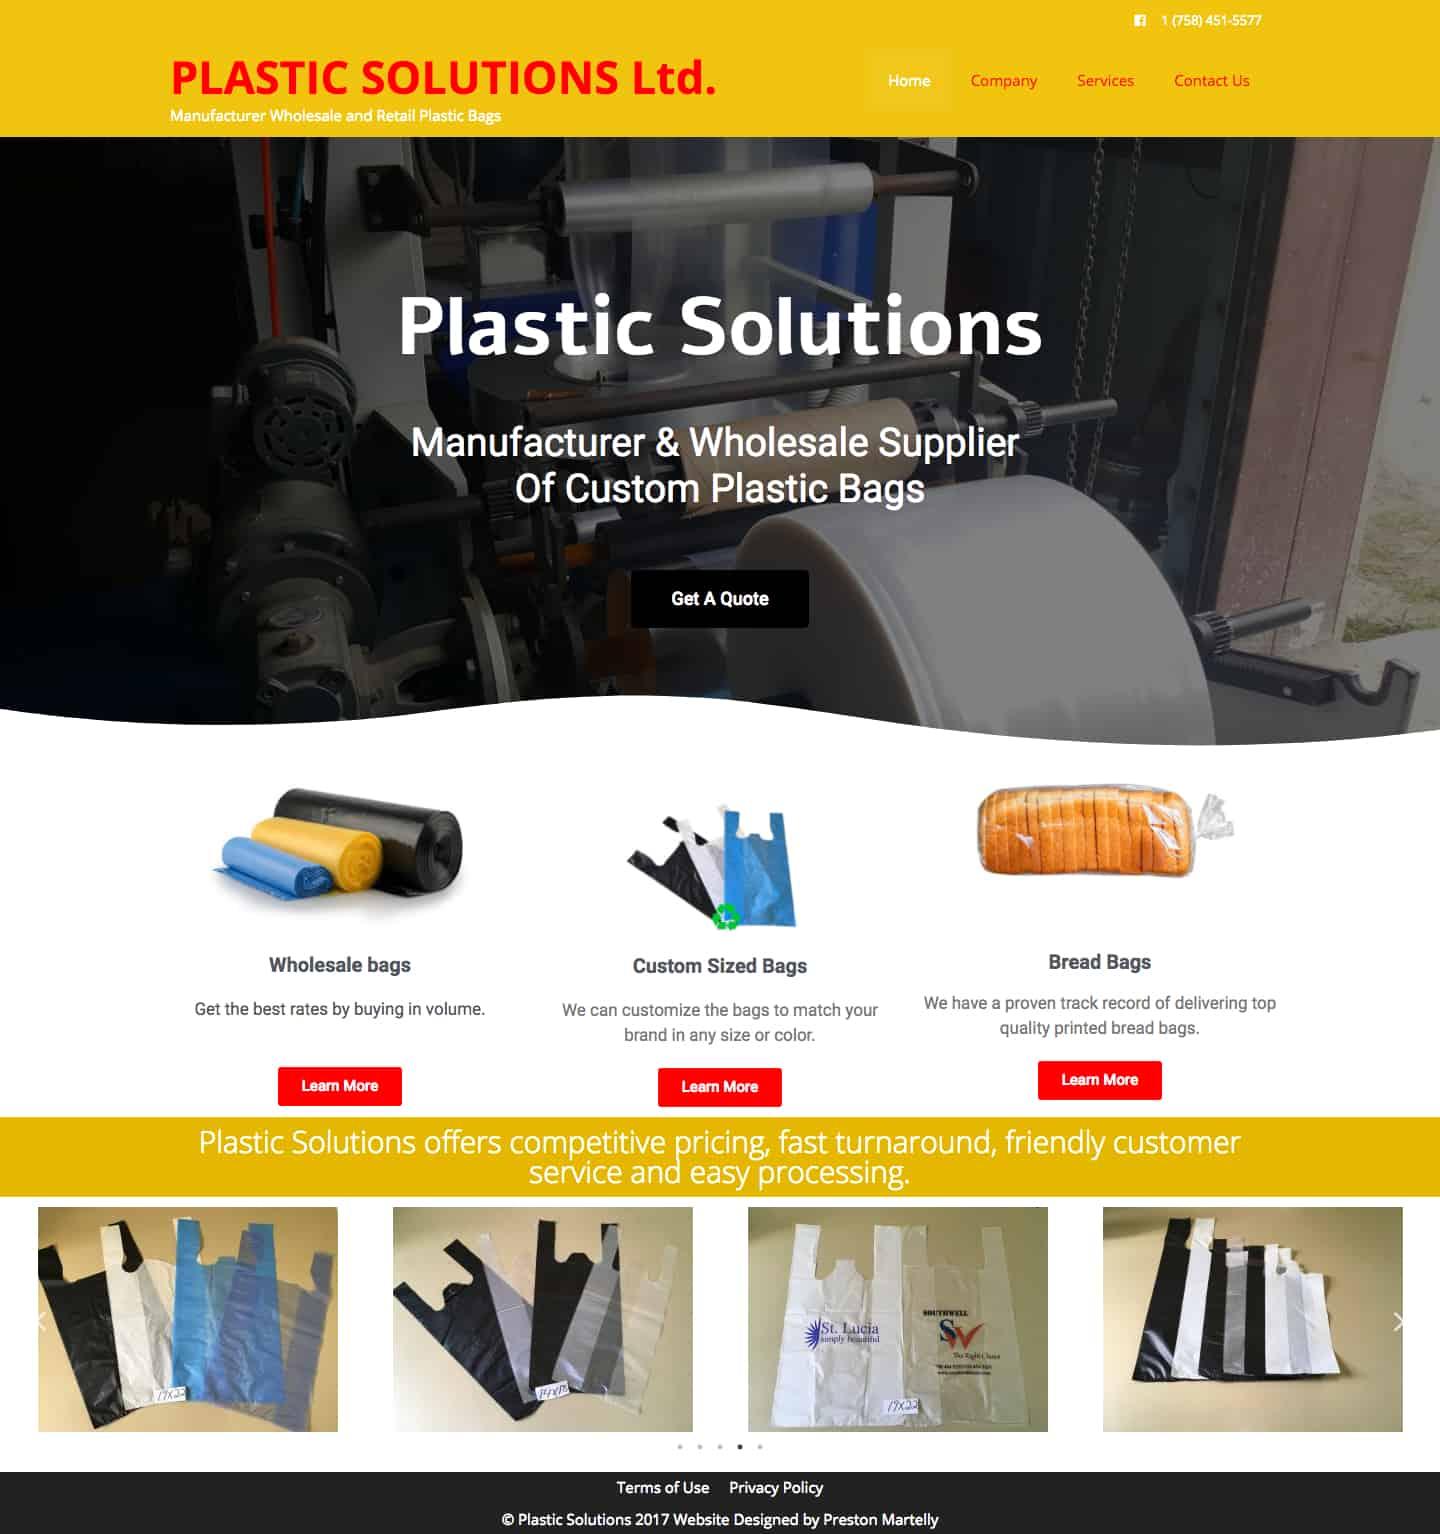 PLASTIC SOLUTIONS Ltd. – Manufacturer Wholesale and Retail Plastic Bags